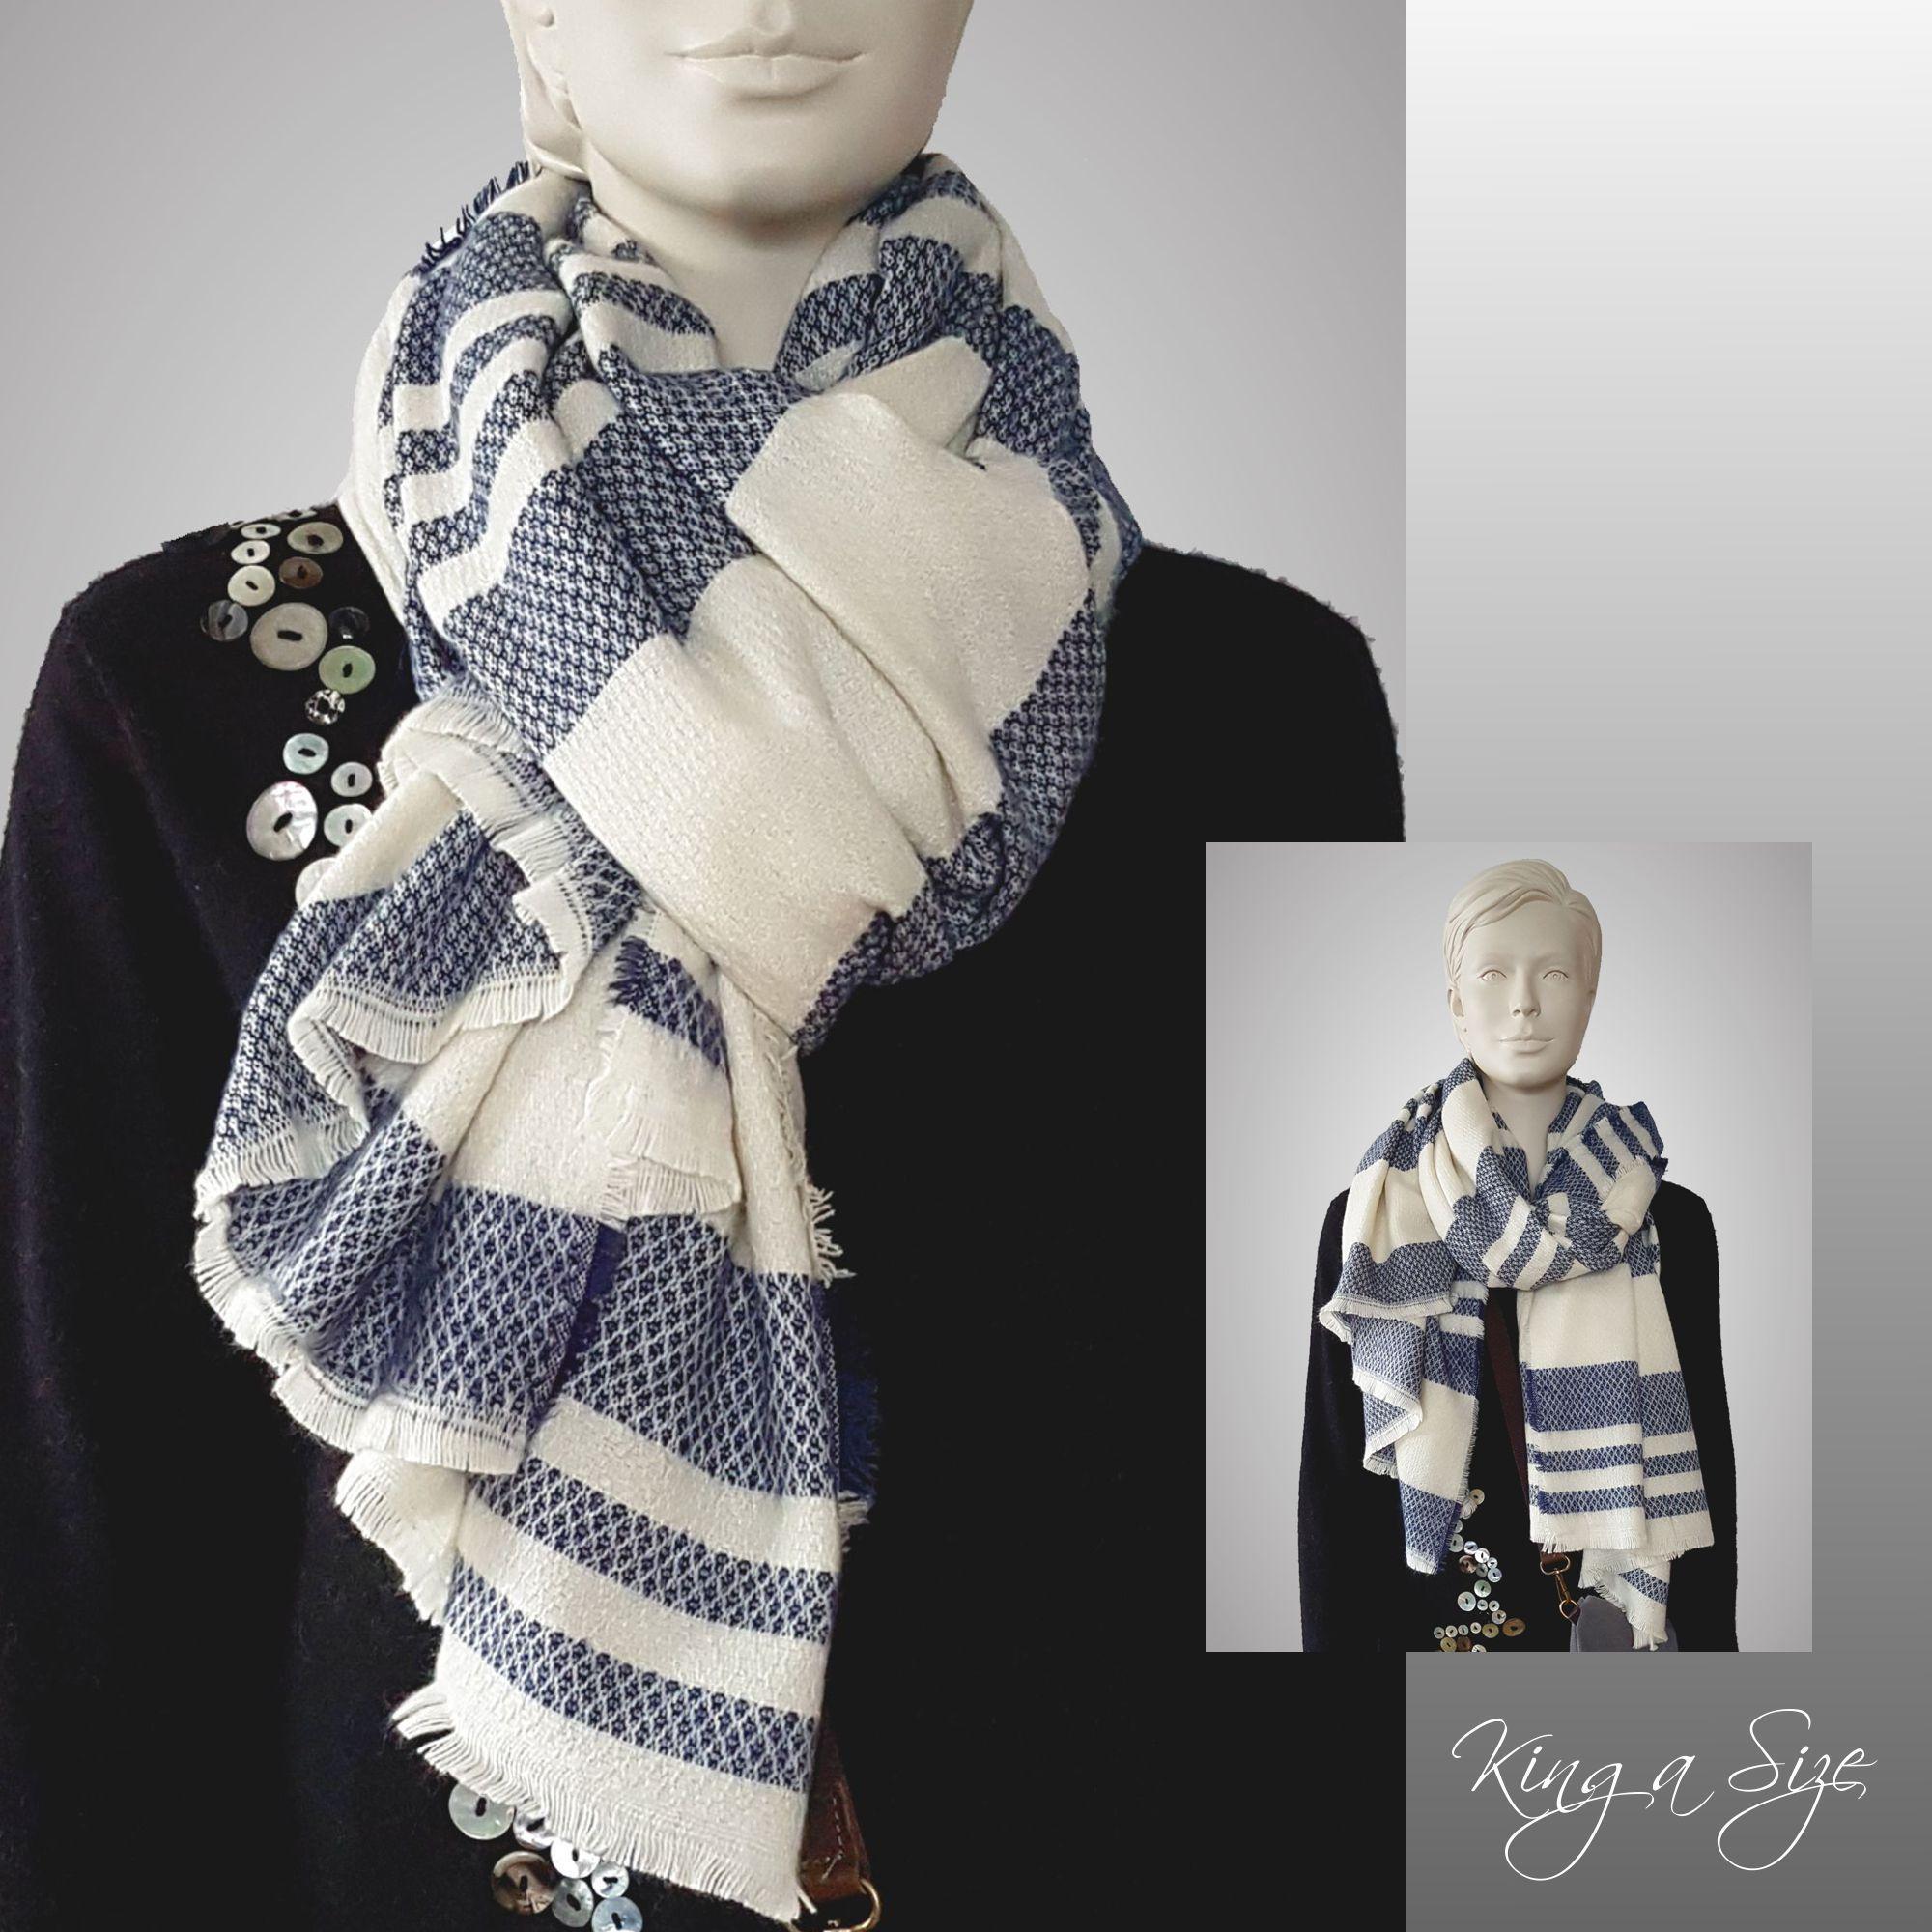 Winterschal Xxl How To Wear Scarves Fashion Winter Scarf